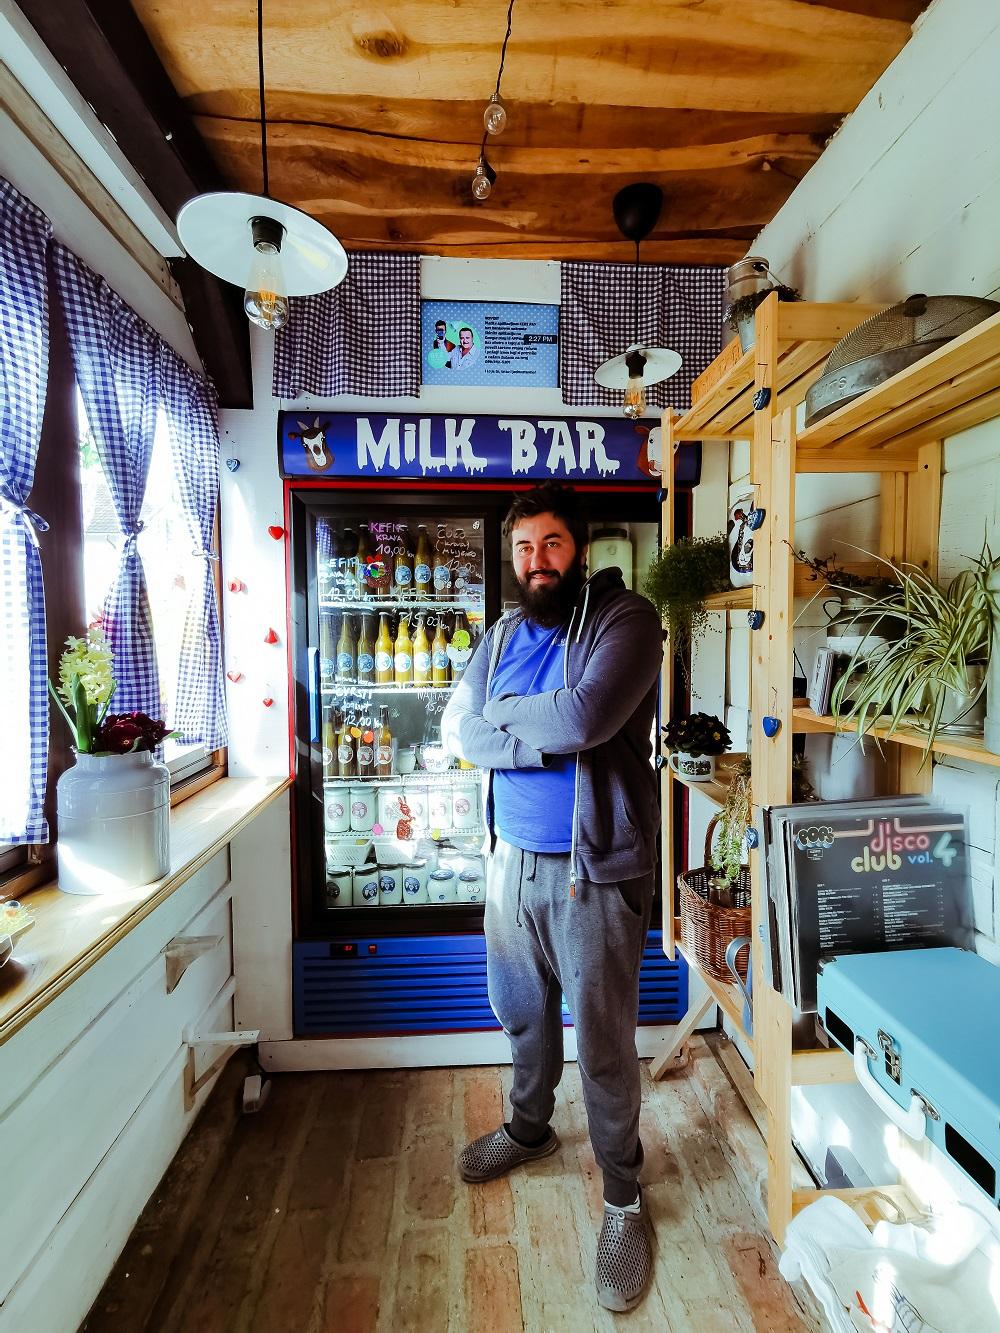 Milk_bar_Vilicom_kroz_hrvatsku